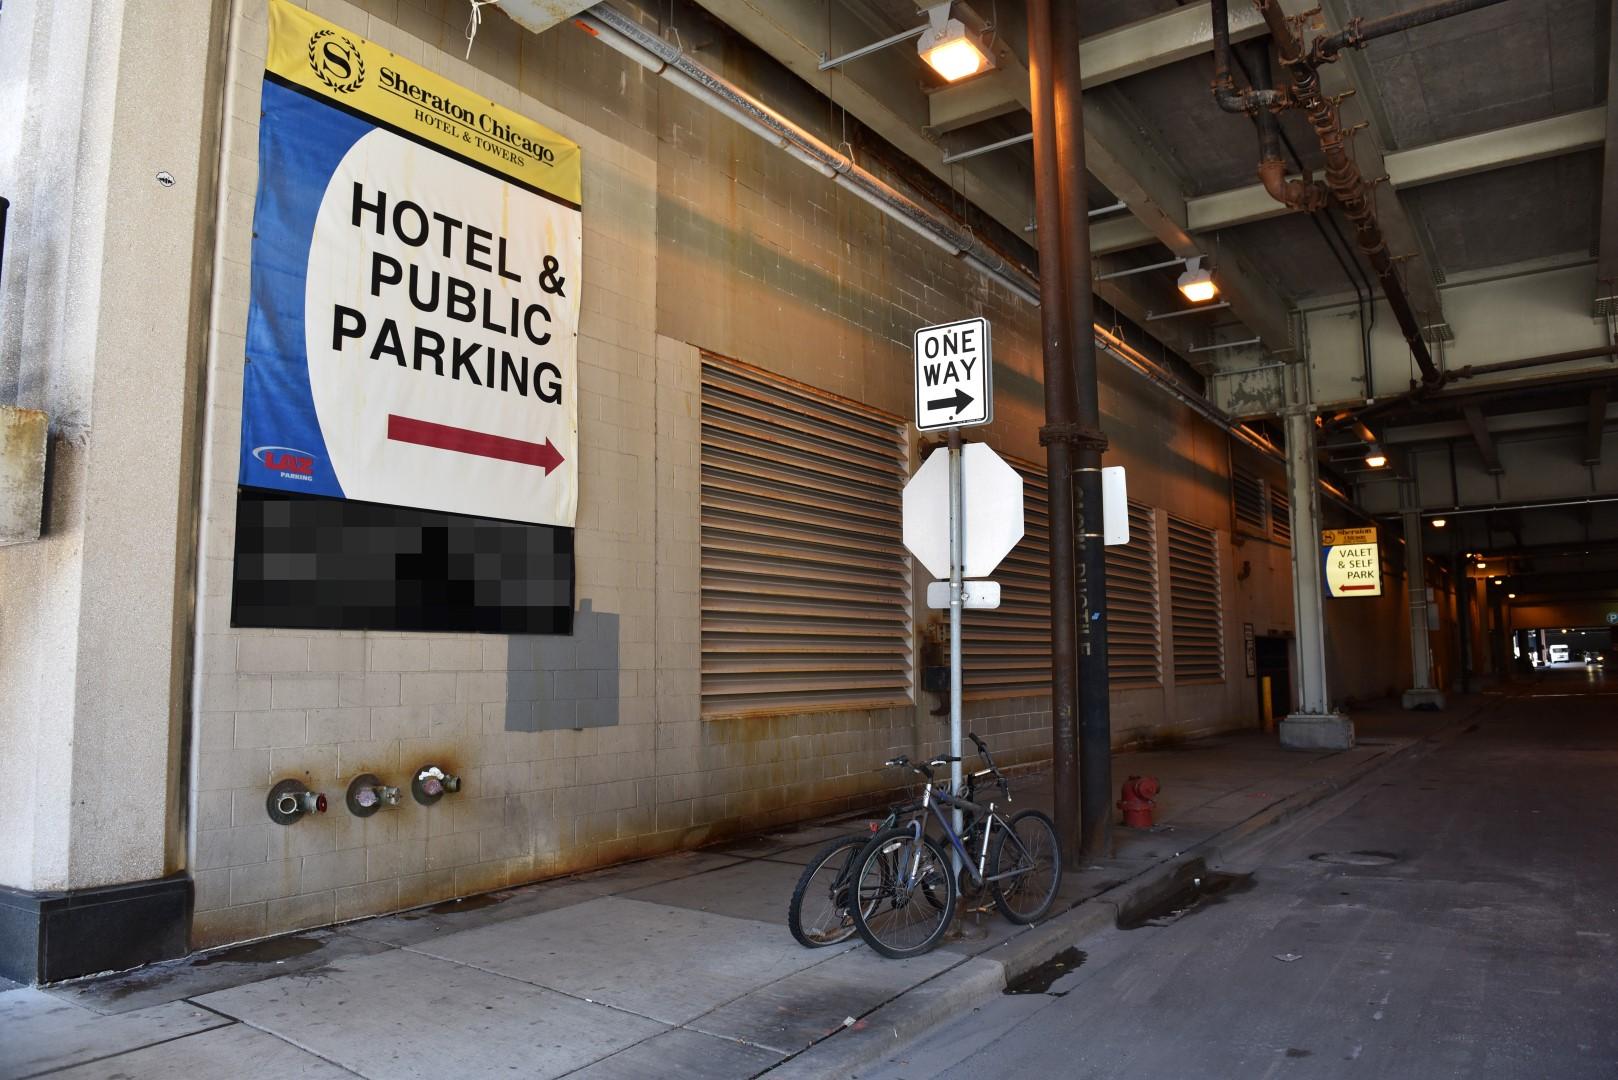 Loews Hotel Parking - Find Parking near Loews Hotel